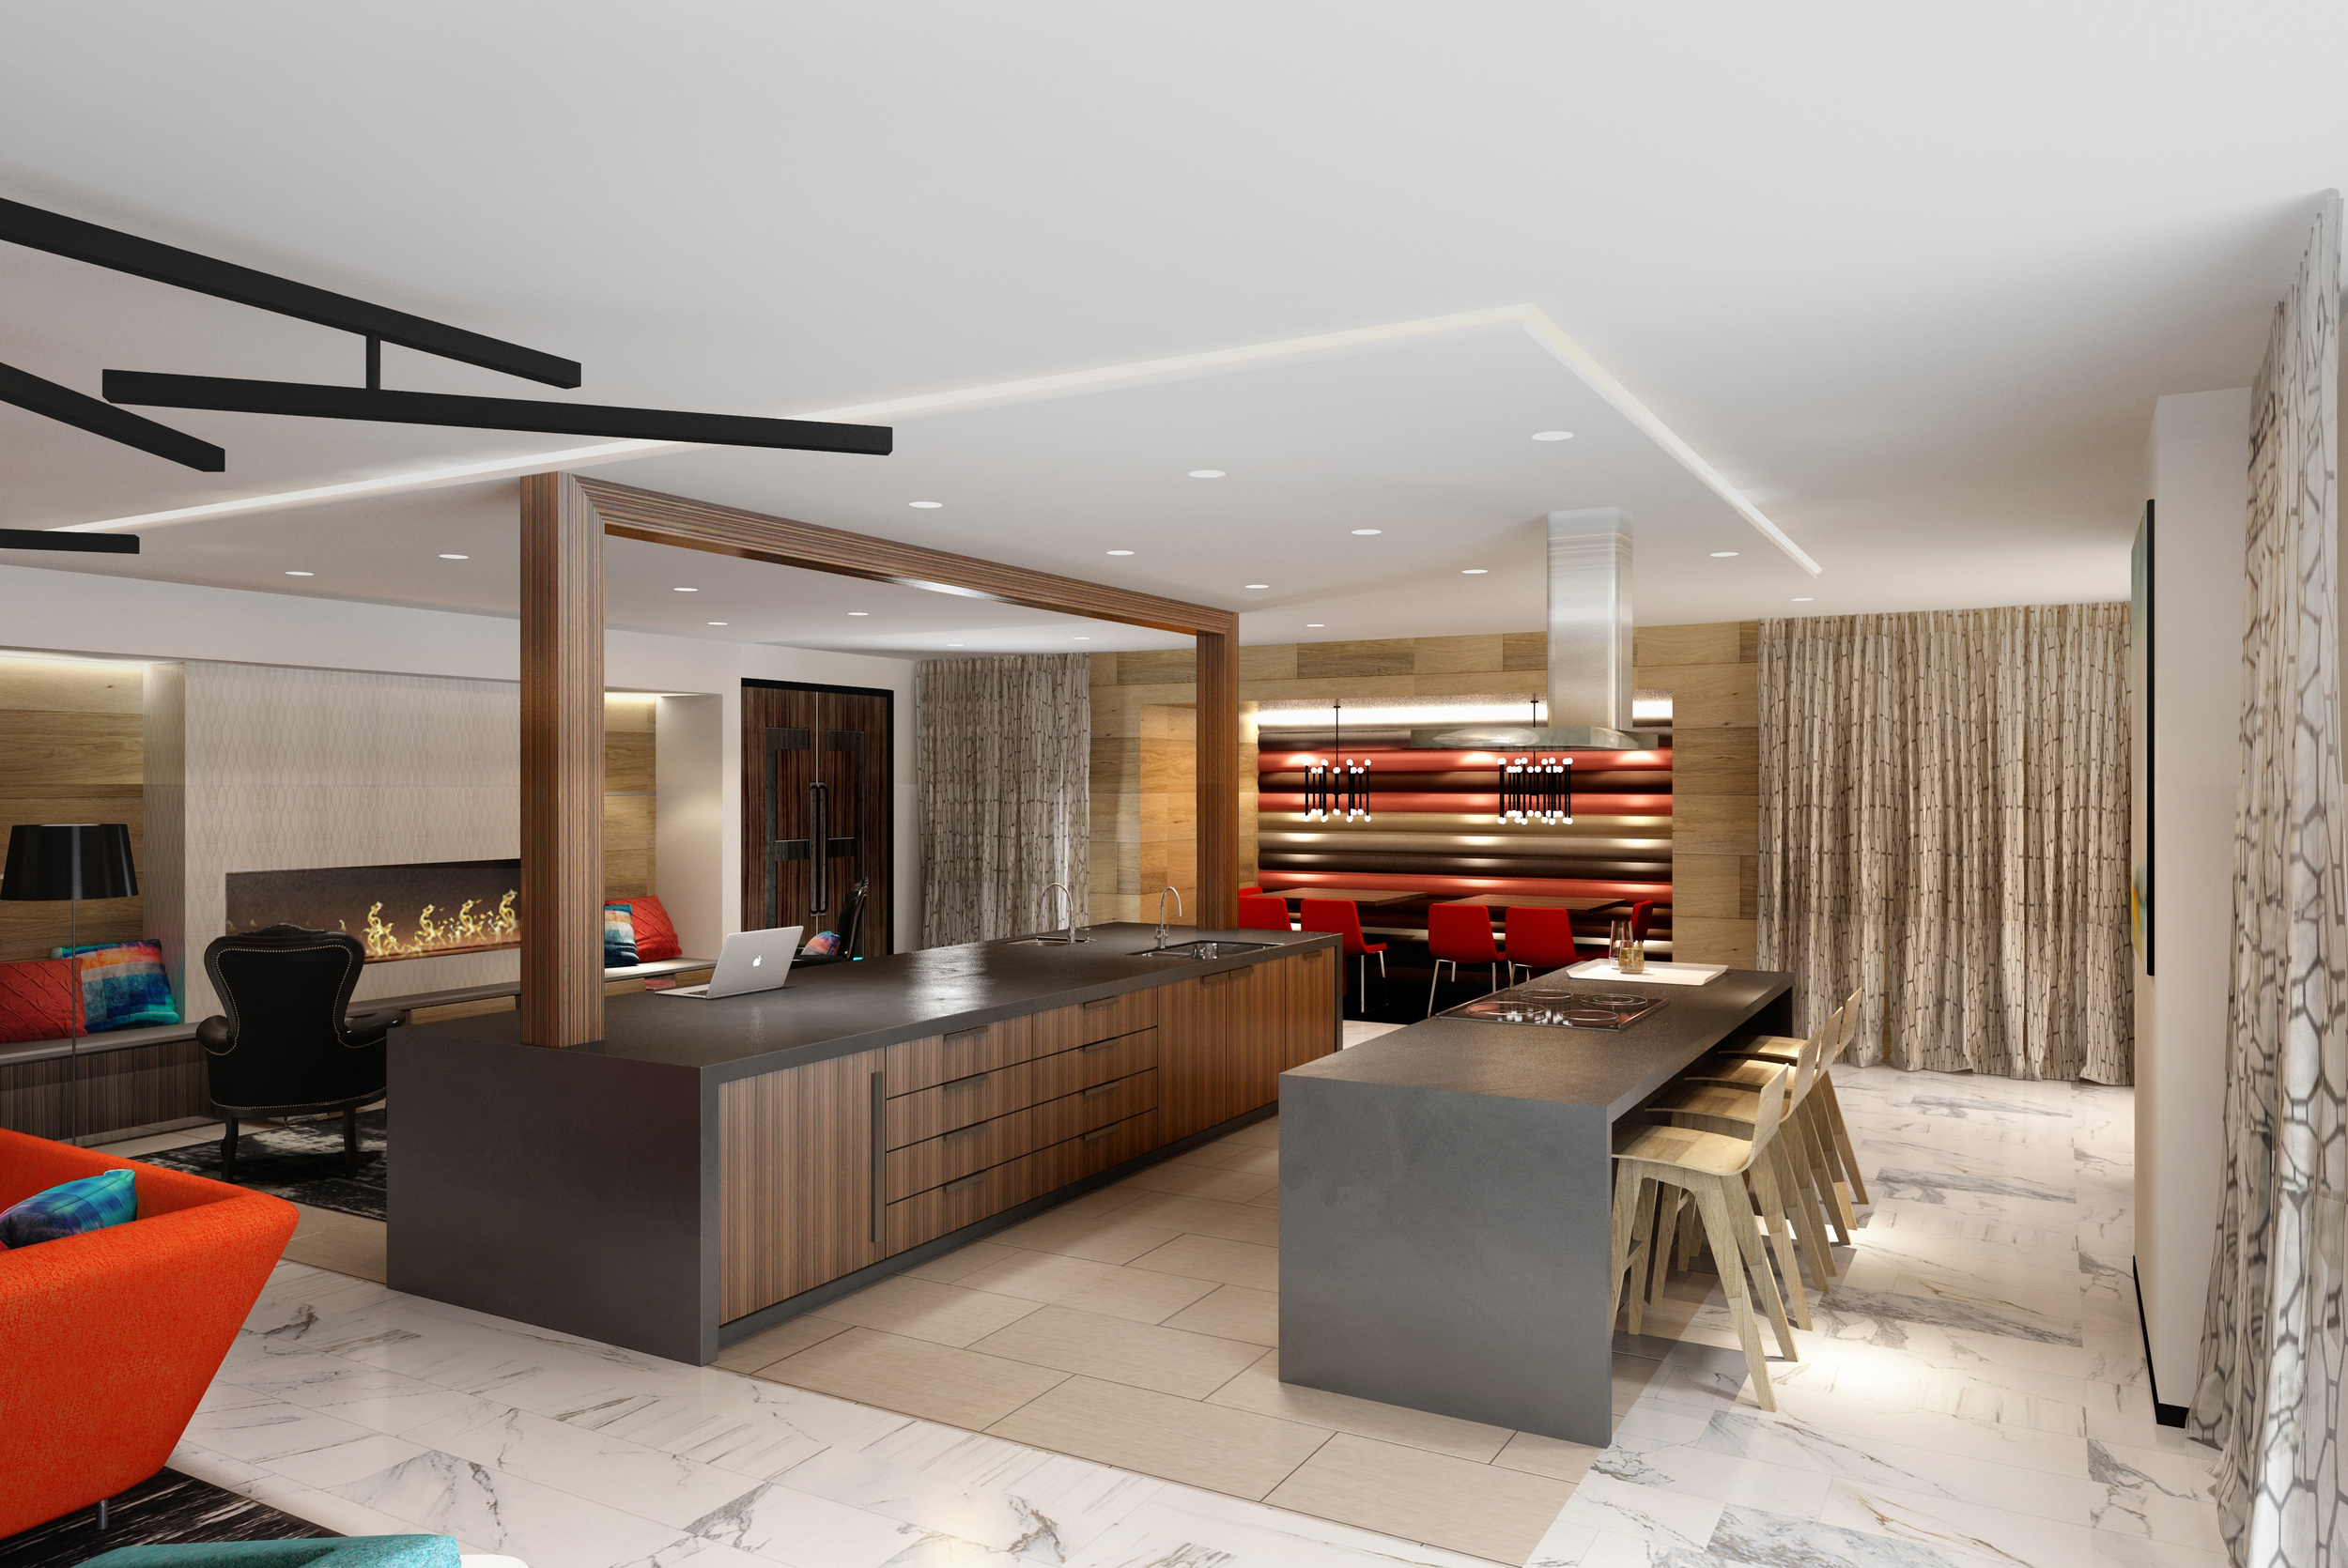 Awesome Housing Interiors Images - Image design house plan - novelas.us